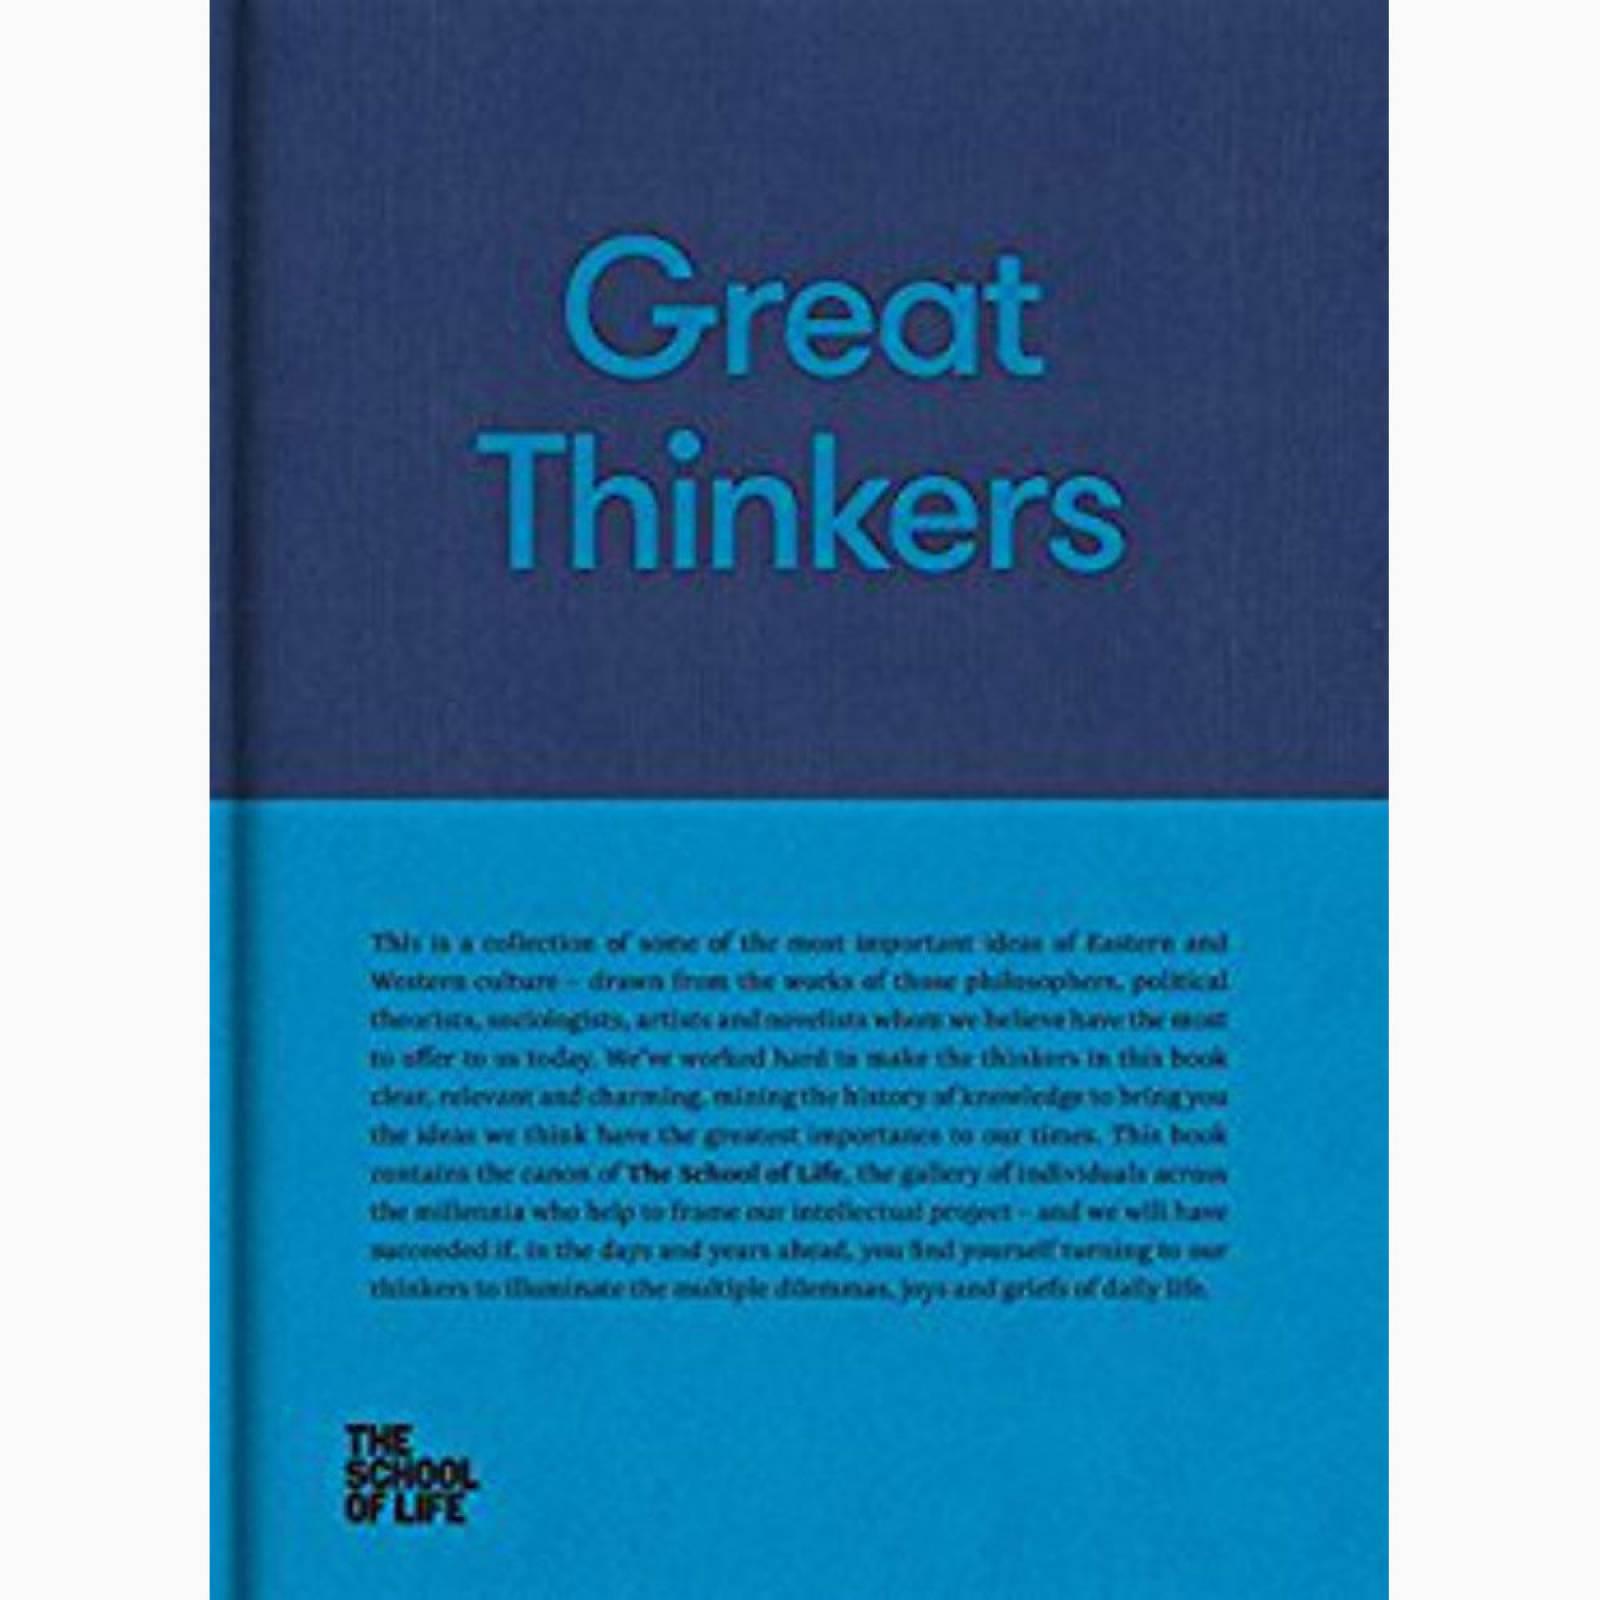 Great Thinkers - School Of Life Hardback Book